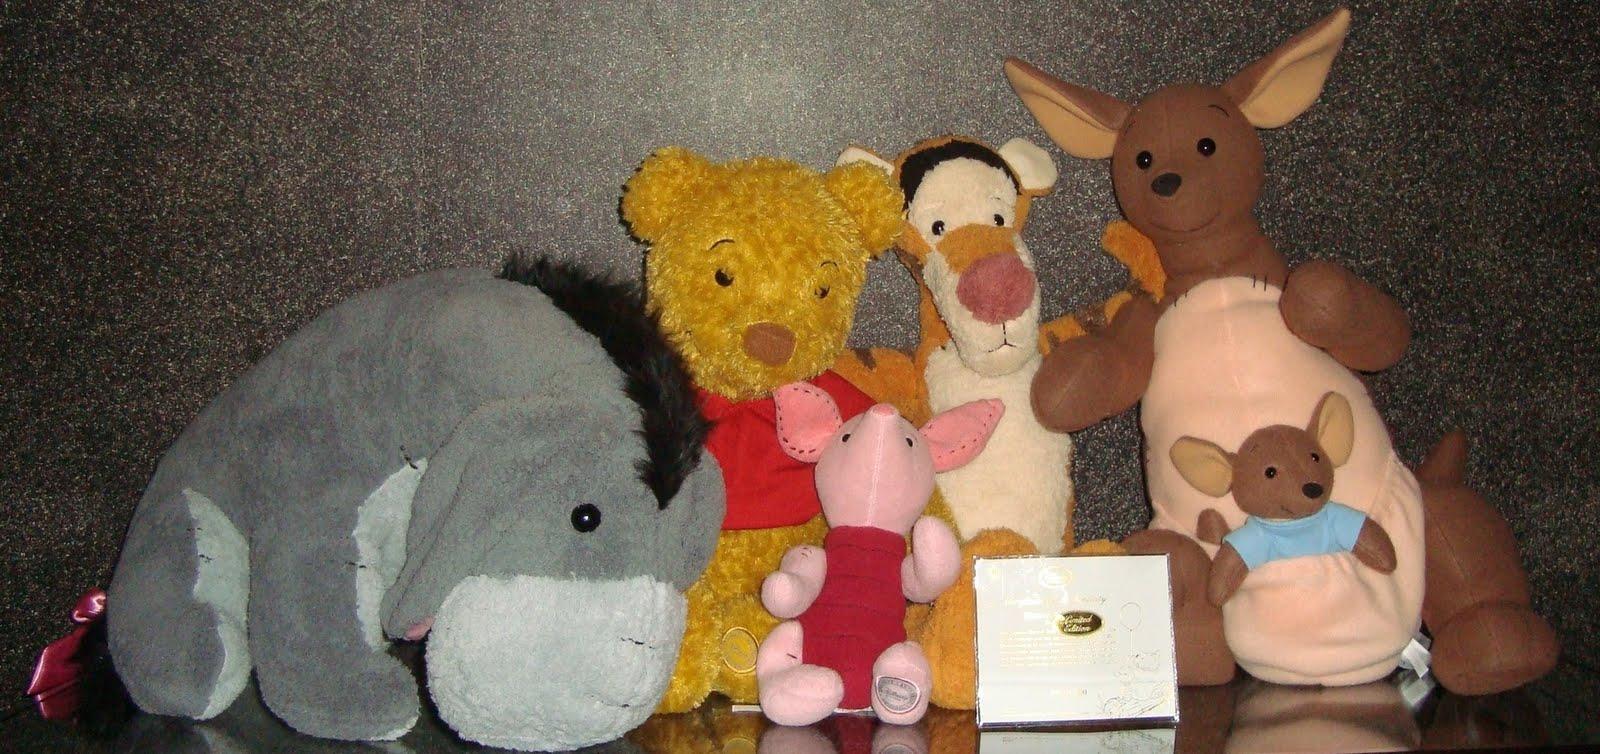 Movie Edition Winnie The Pooh Plush This Winnie The Pooh Plush Set